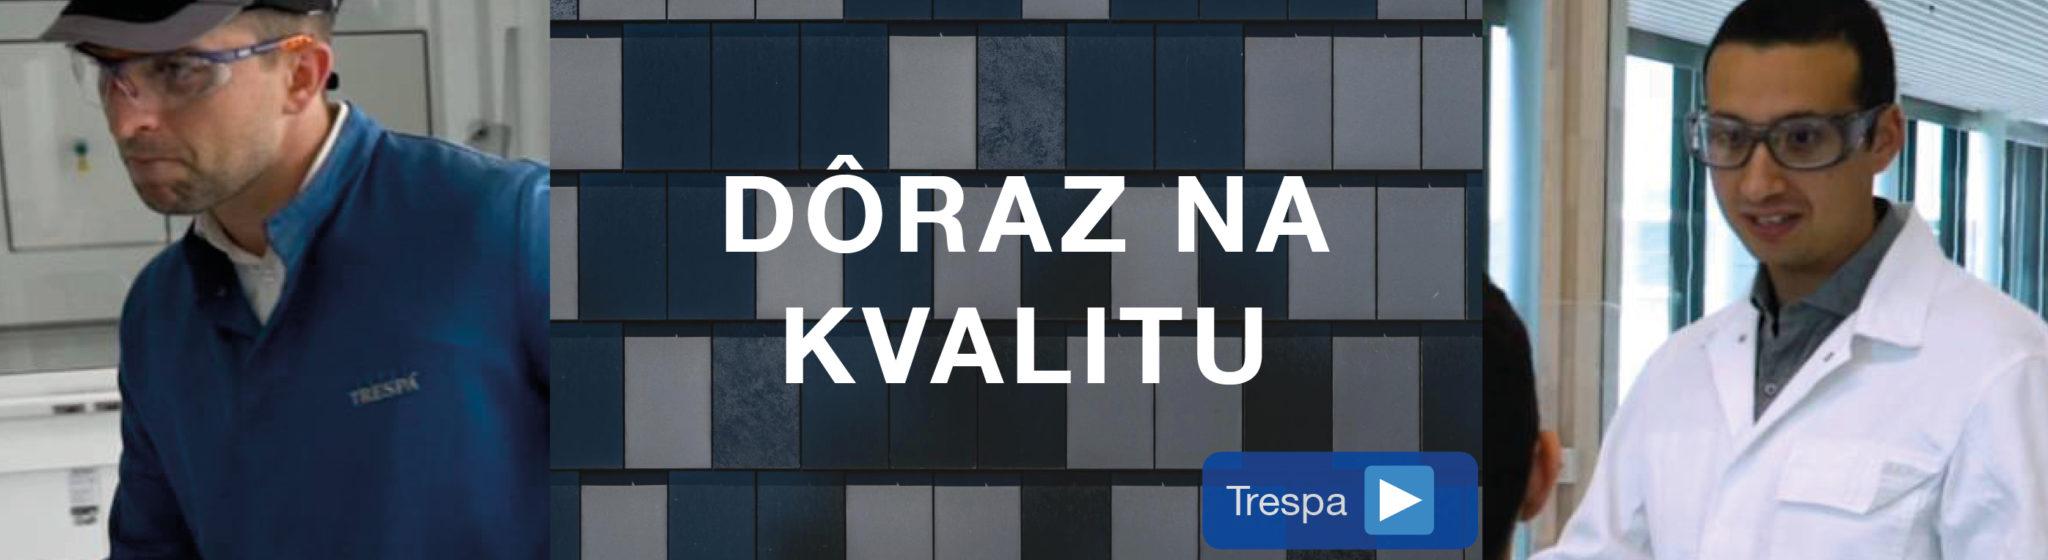 Trespa-HPL-dosky-prevetravana-fasada-kvalita